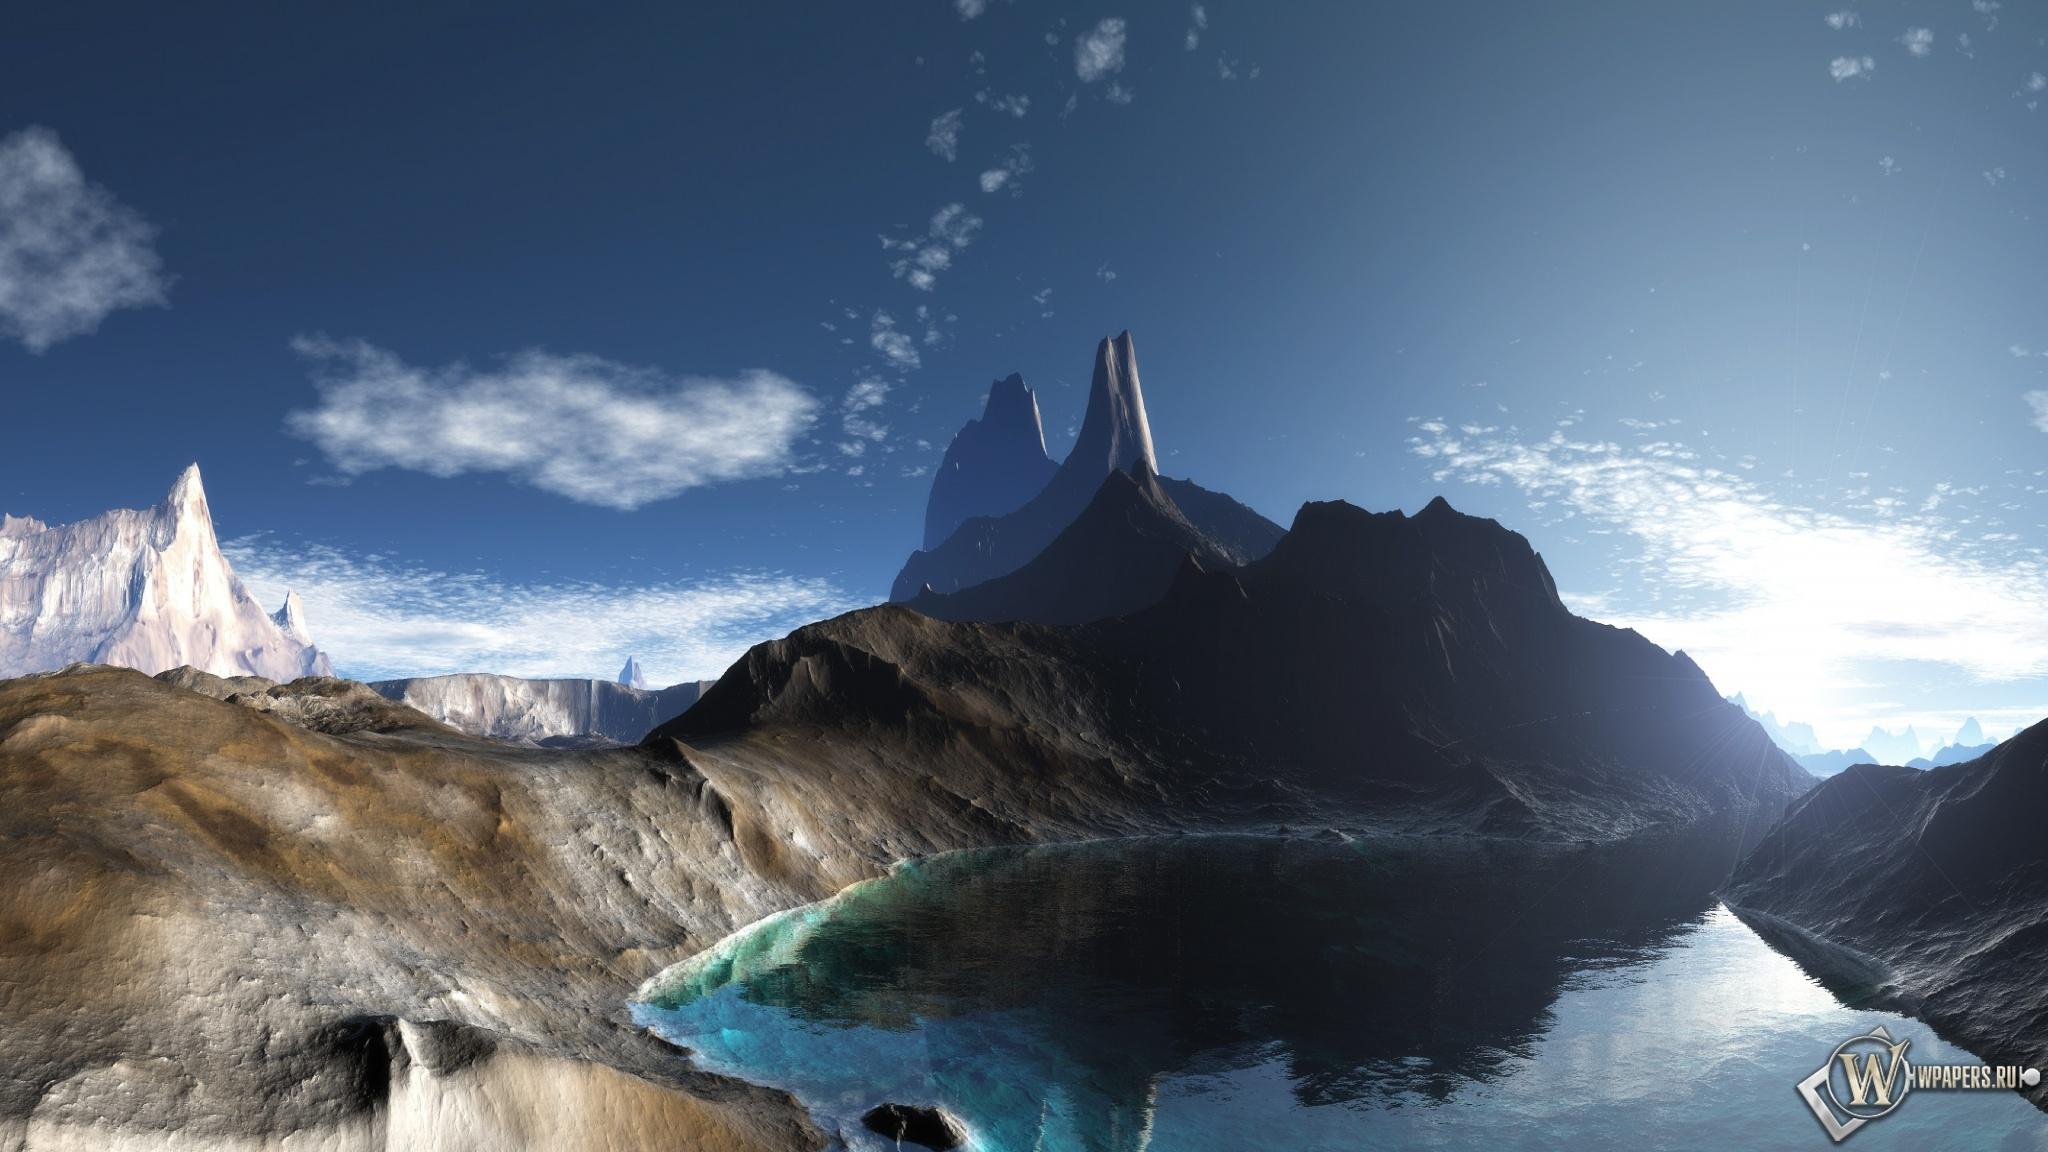 Горное озеро 2048x1152